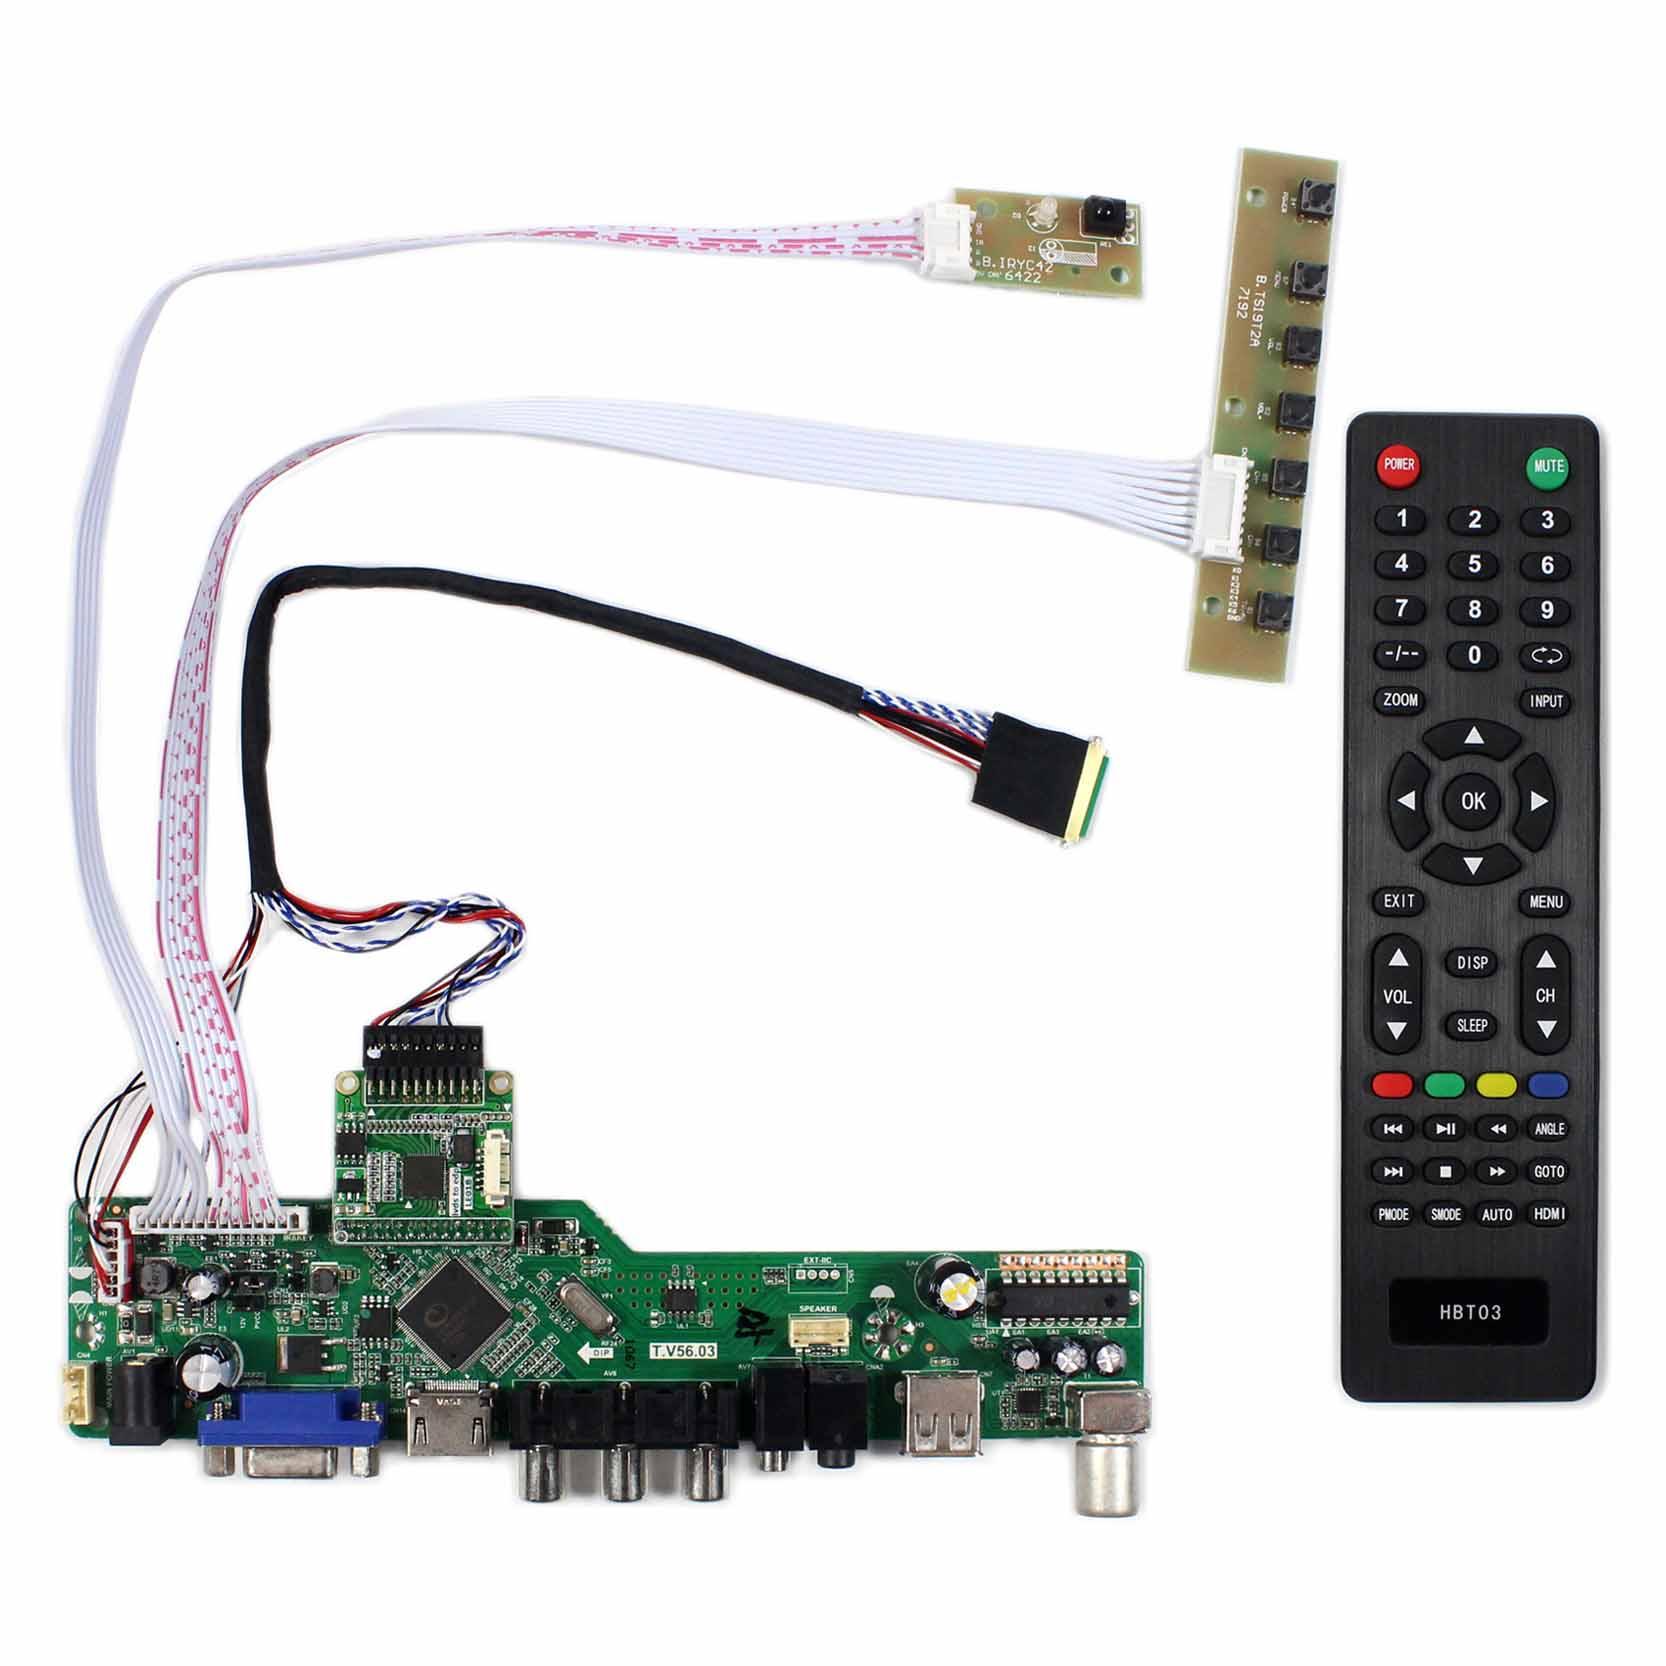 TV+HDMI+VGA+AV+USB+AUDIO LCD Controller Board Work For 11.6inch 1920x1080 N116HSE eDP LCD Screen vga hdmi lcd controller board for lp156whu tpb1 lp156whu tpa1 lp156whu tpbh lp156whu tpd1 15 6 inch edp 30 pins 1 lane 1366x768